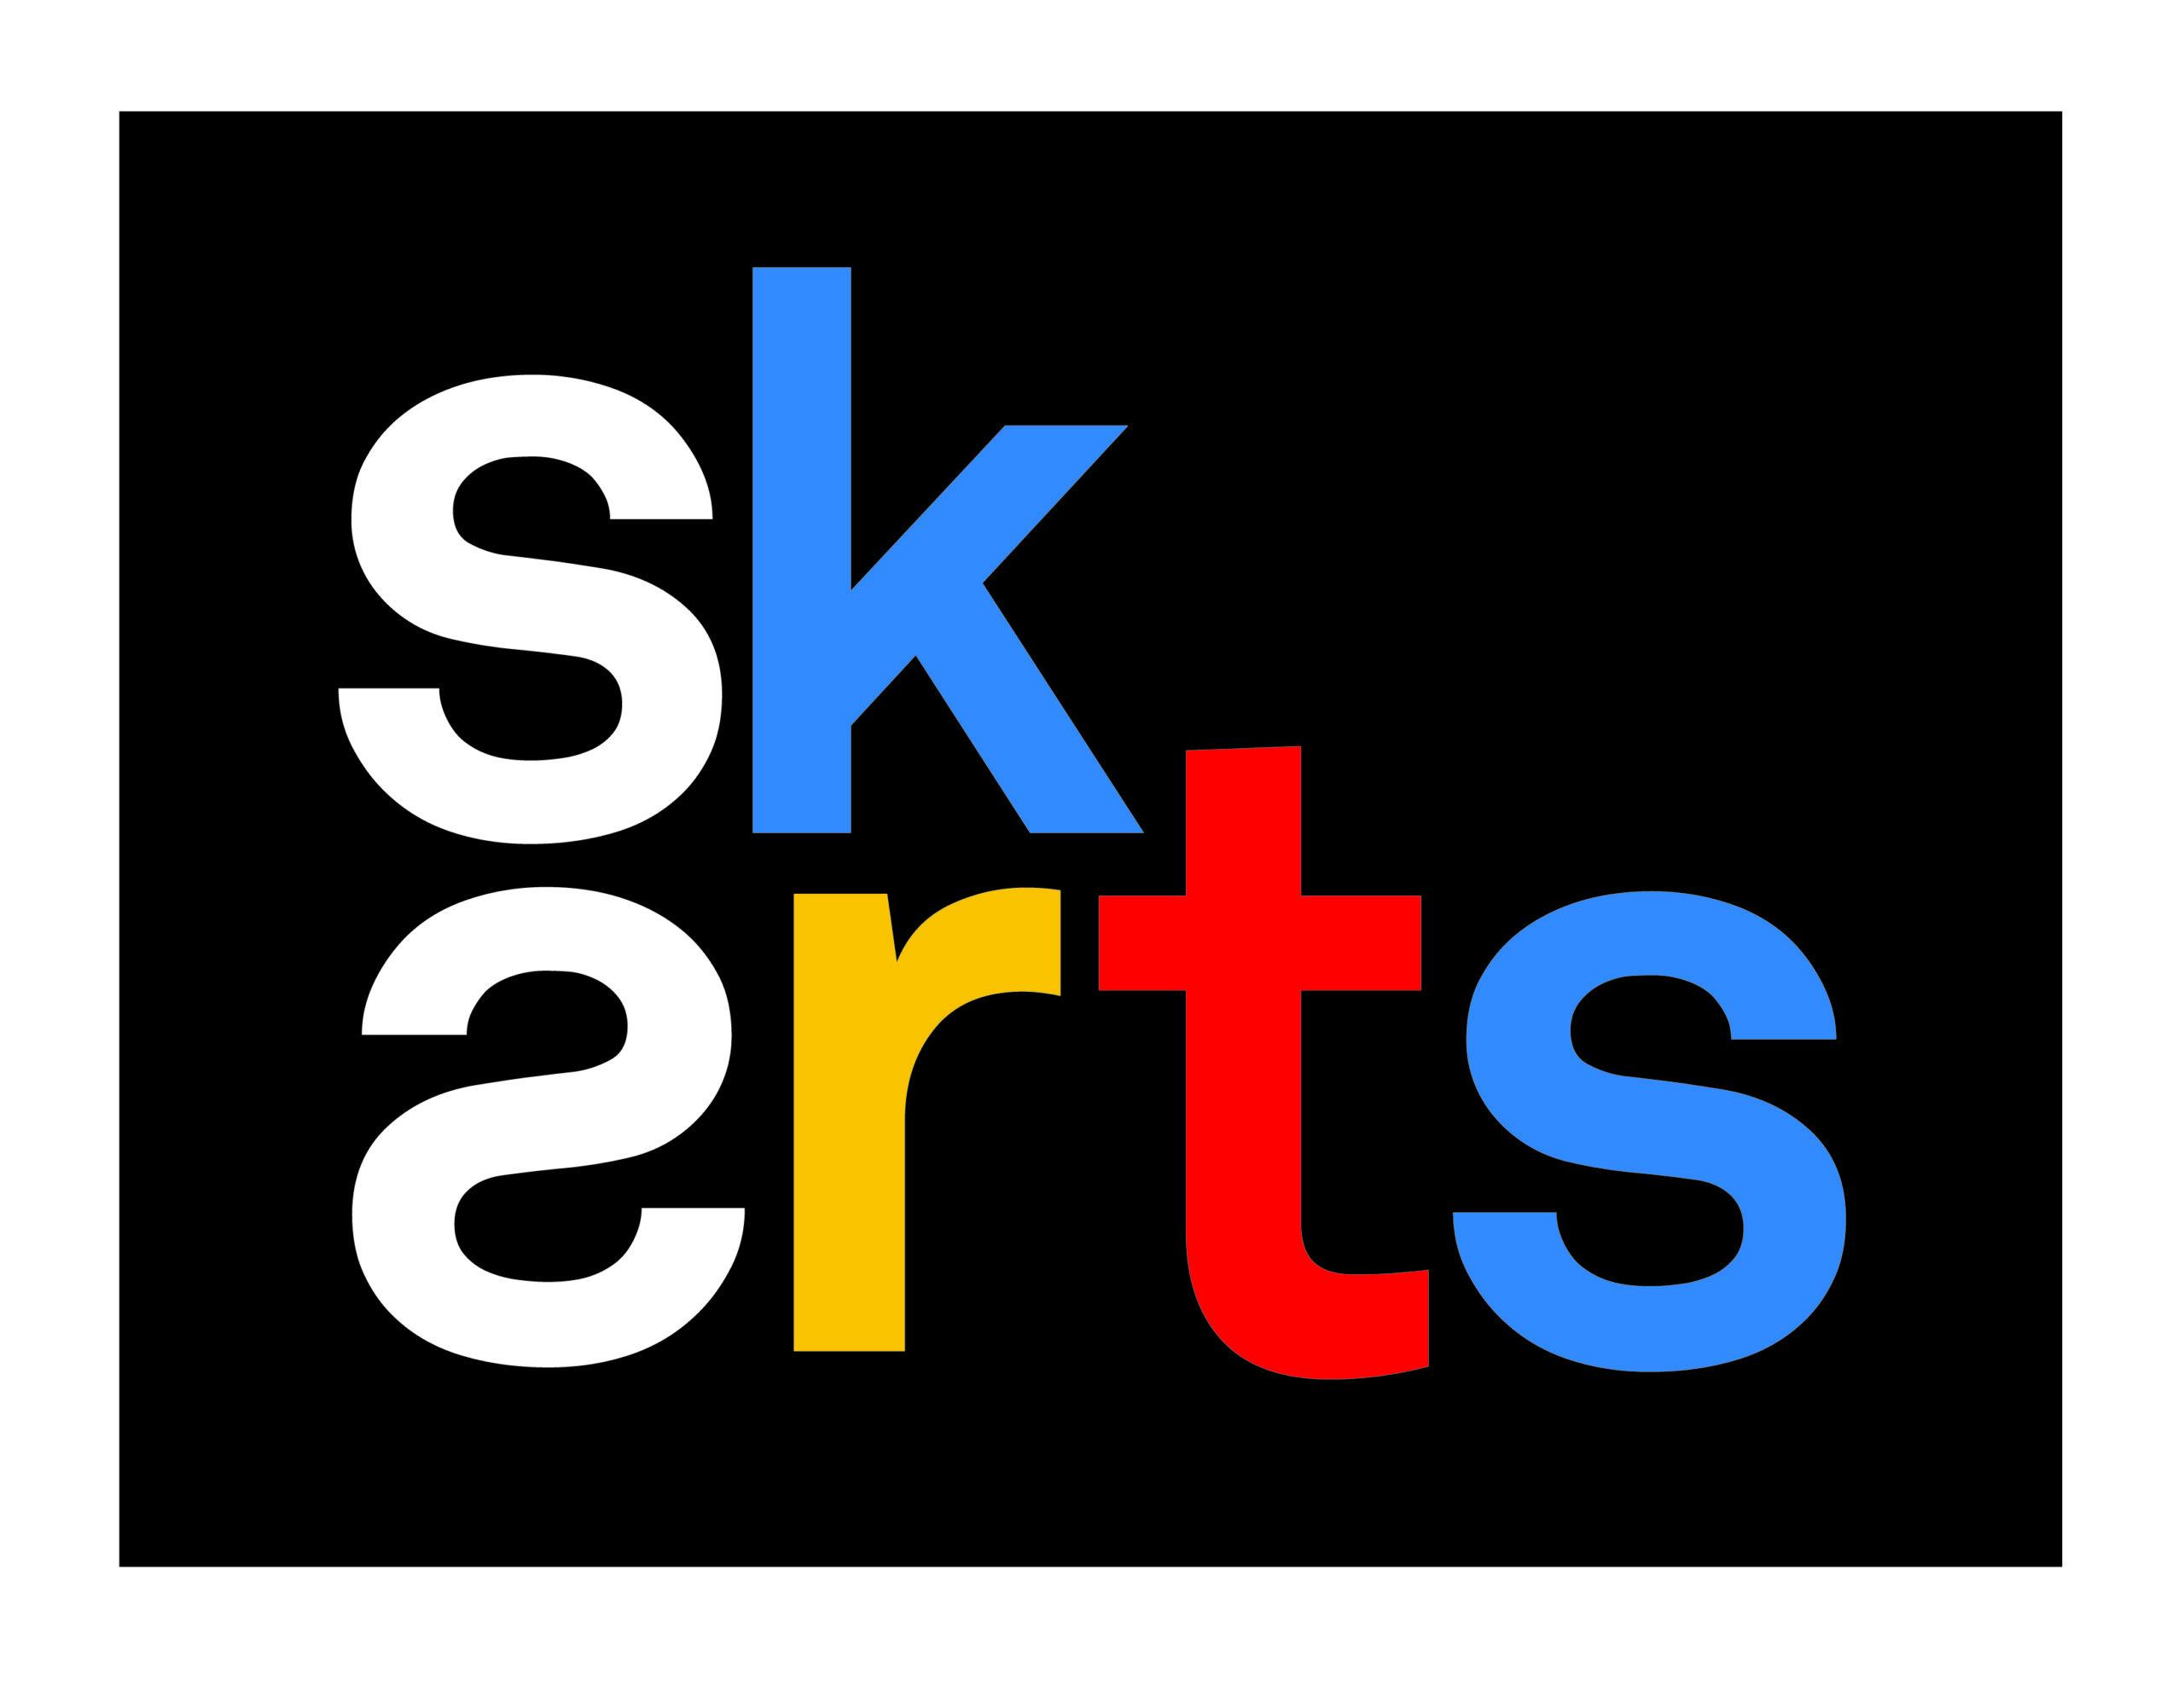 Saskatchewan Arts Board Logo in blue, yellow, red, white and black